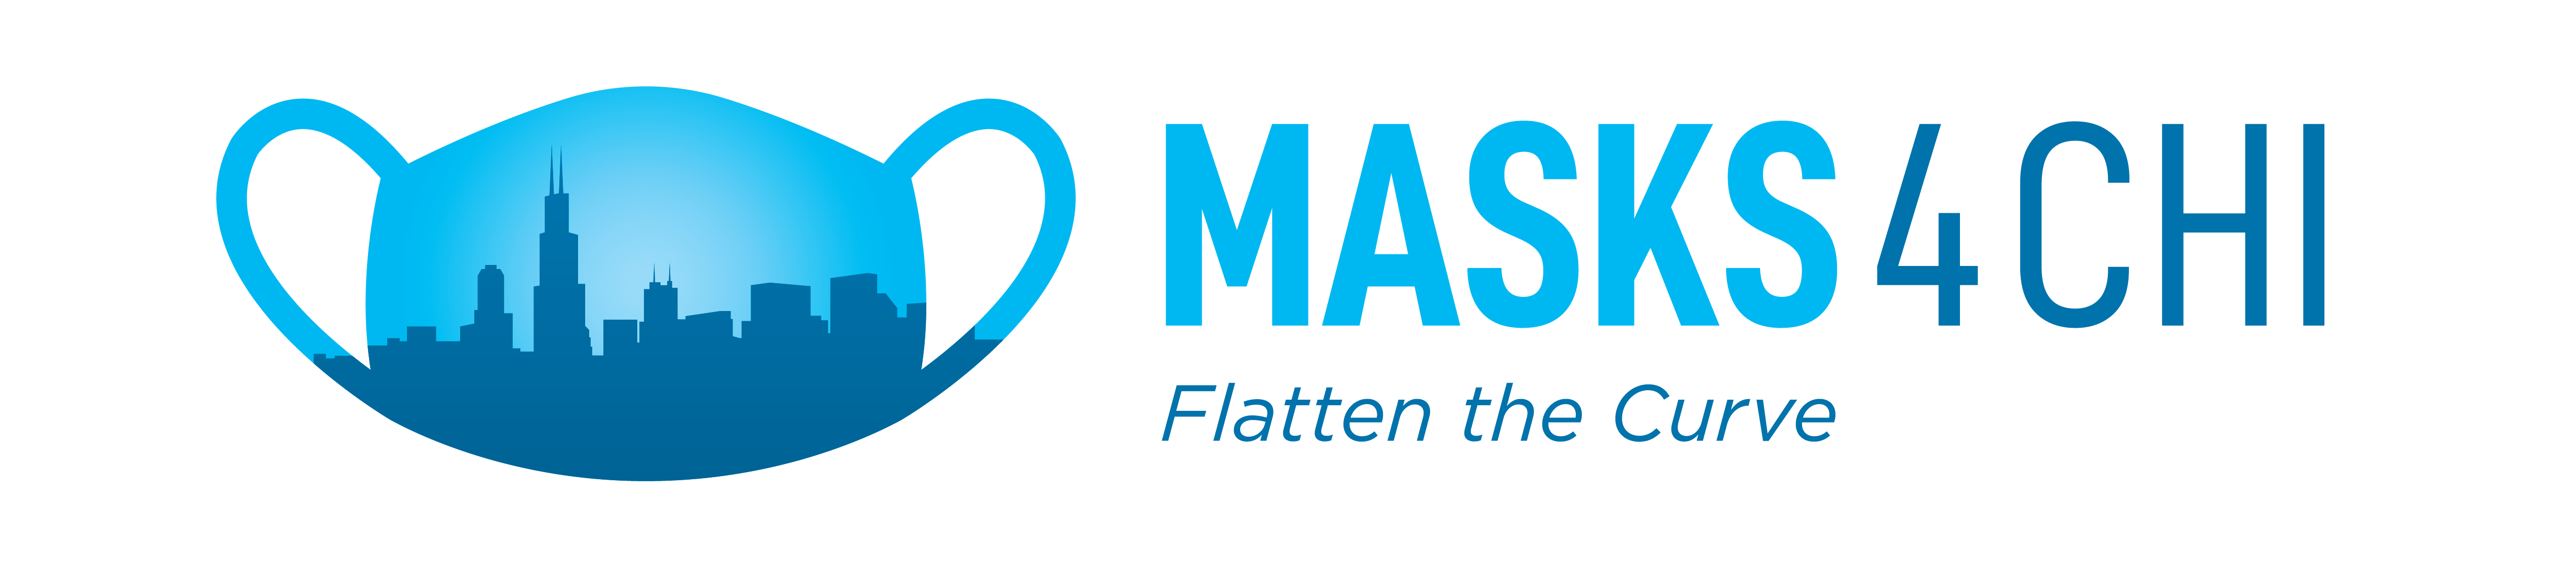 Masks4Chi